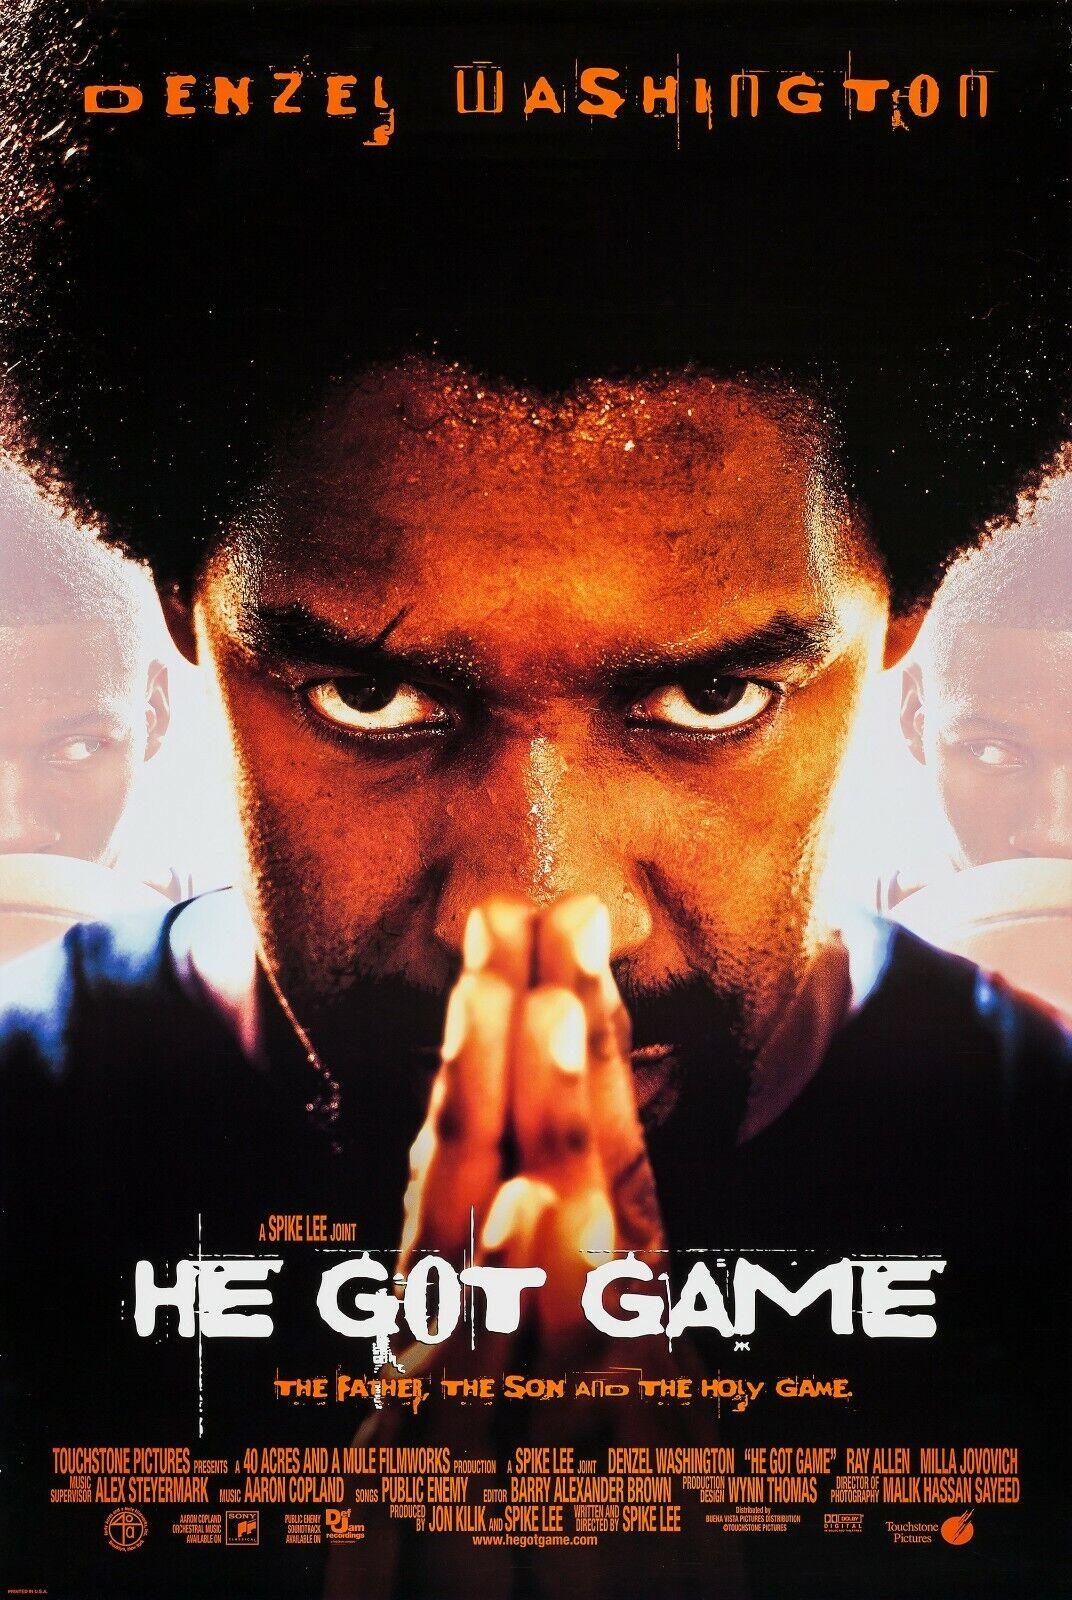 "He Got Game movie poster  - 11"" x 17"" - Denzel Washington, Spike Lee"